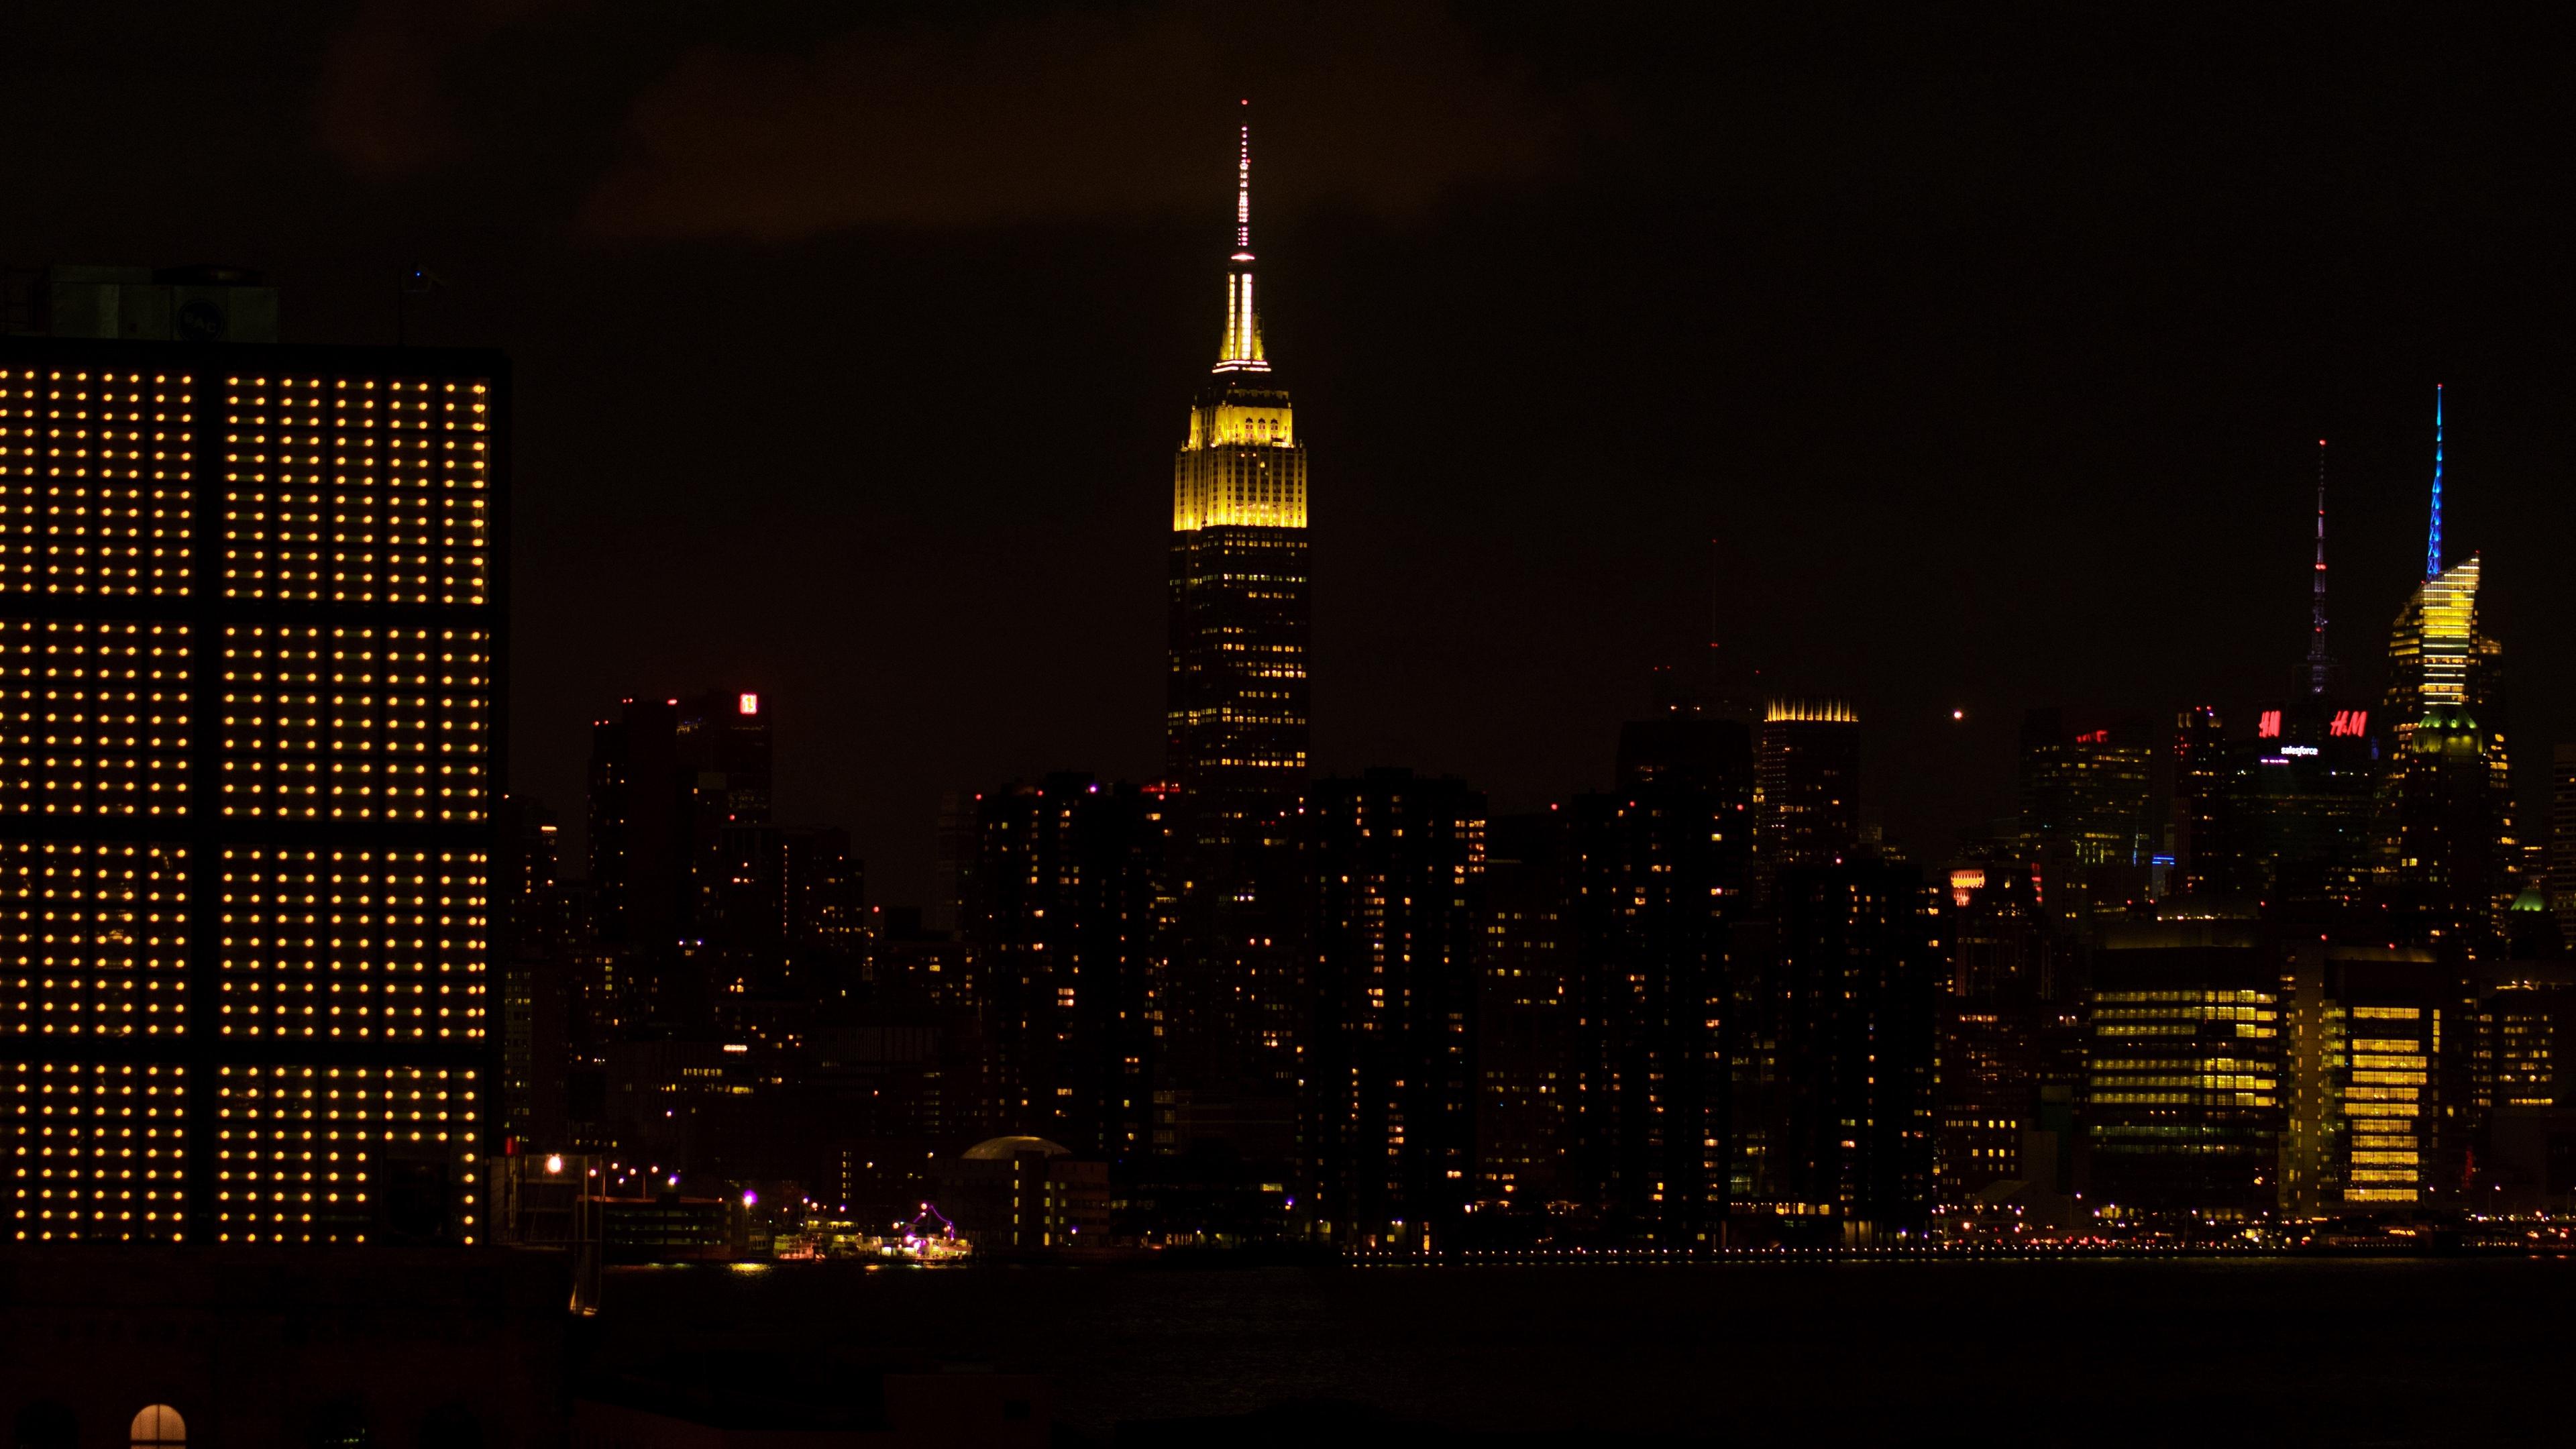 night city skyscraper city lights metropolis new york united states 4k 1538066669 - night city, skyscraper, city lights, metropolis, new york, united states 4k - Skyscraper, night city, city lights